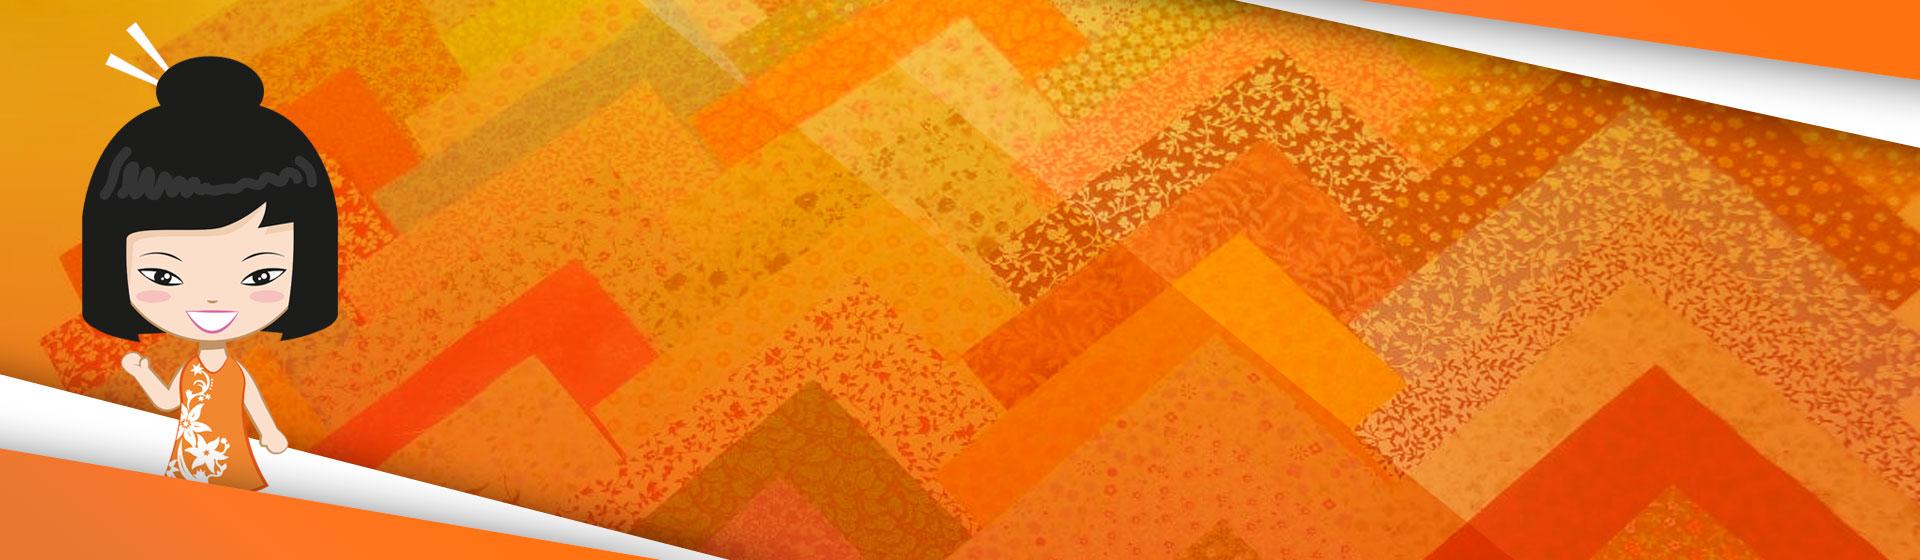 Banner p patchwork